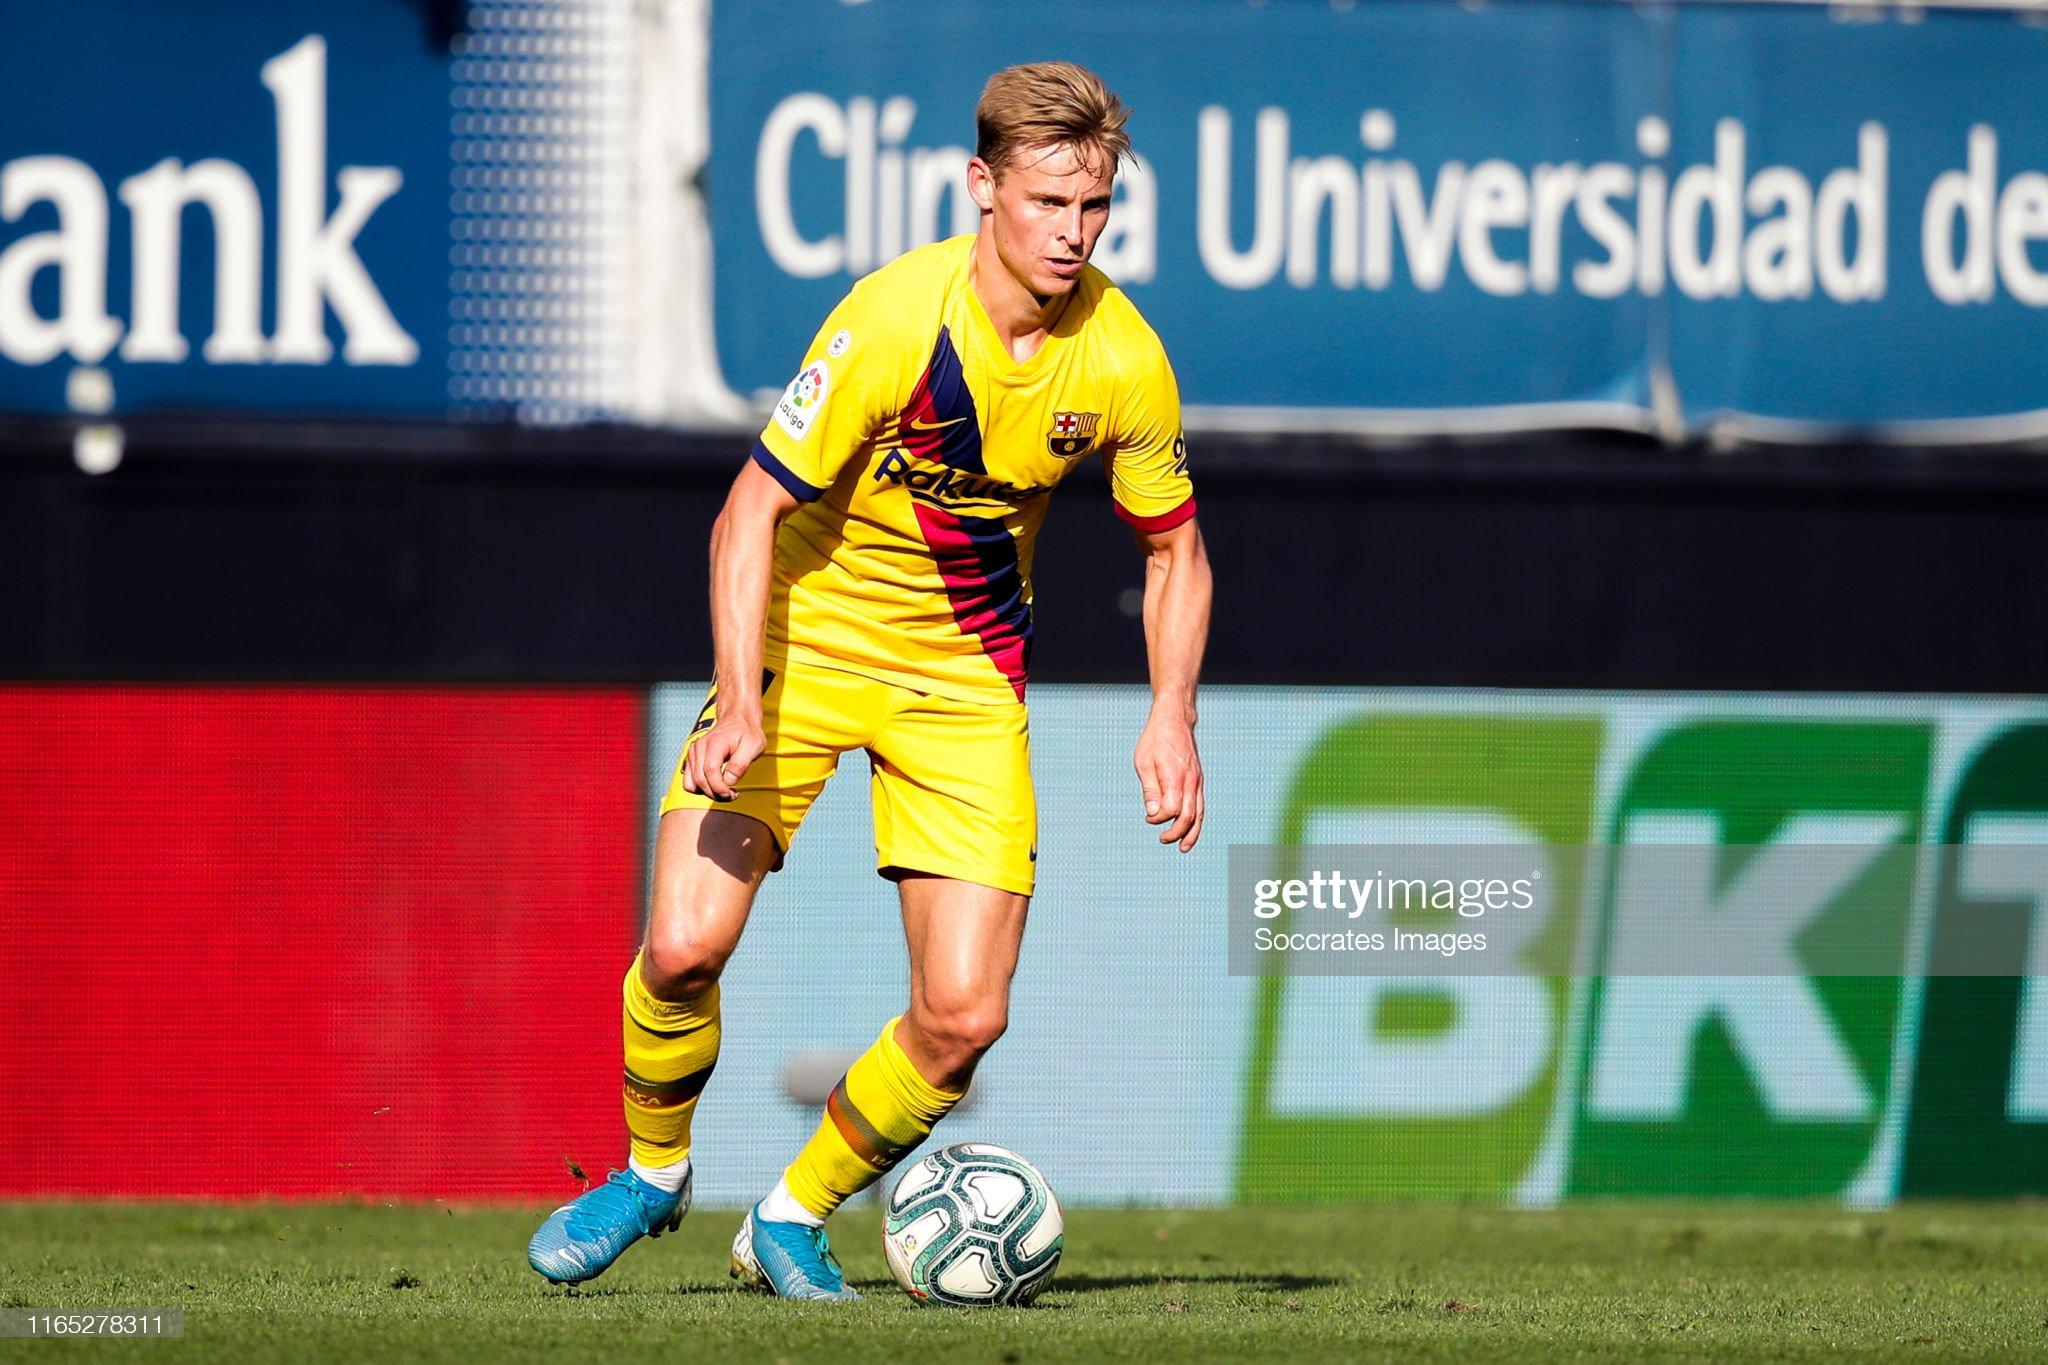 صور مباراة : أوساسونا - برشلونة 2-2 ( 31-08-2019 )  Frenkie-de-jong-of-fc-barcelona-during-the-la-liga-santander-match-picture-id1165278311?s=2048x2048